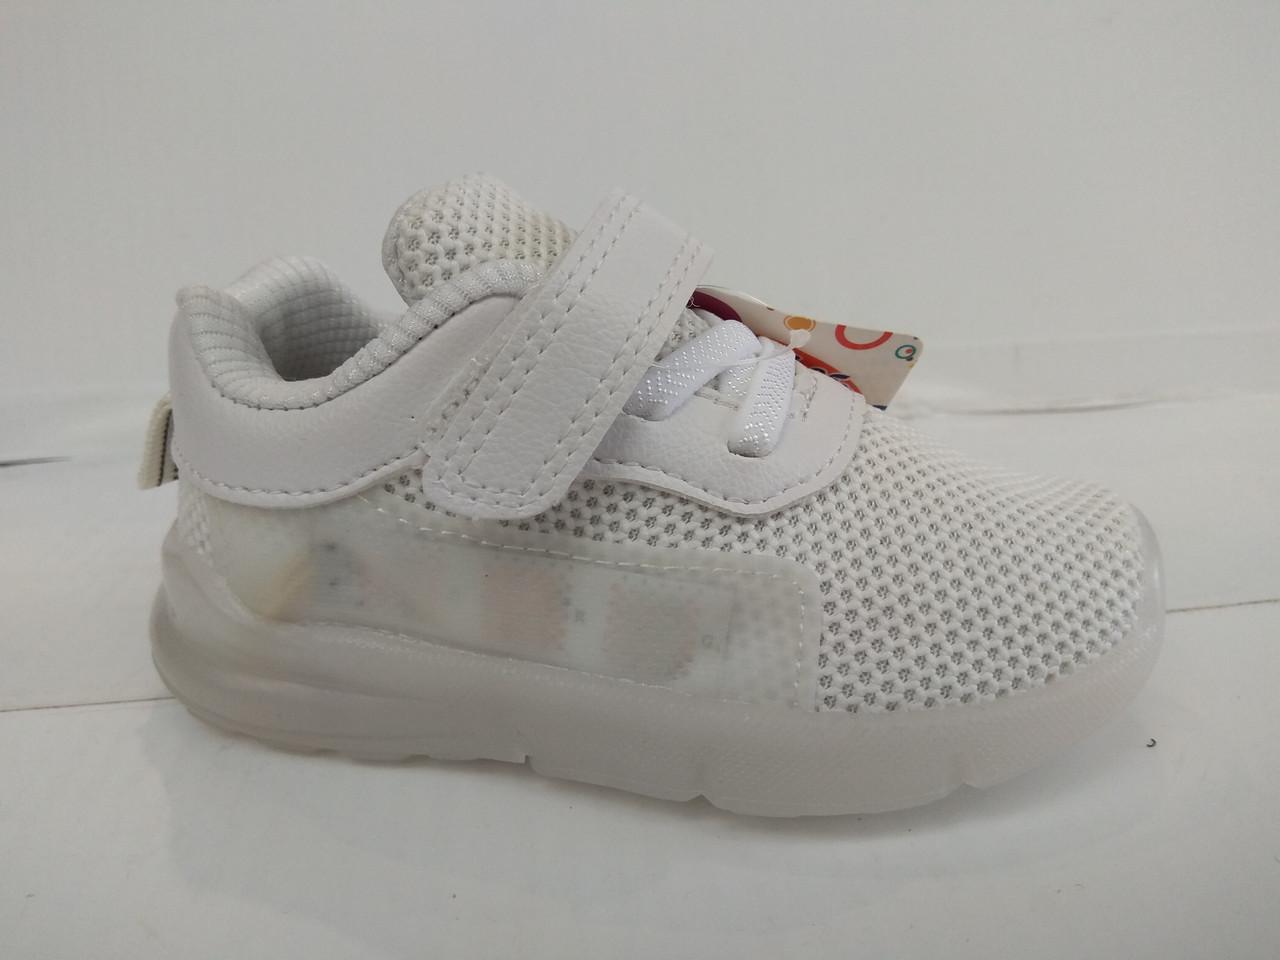 5acc56ffe Детские LED кроссовки оптом Jong.Golf A2420-7 (р.21-26) : продажа ...